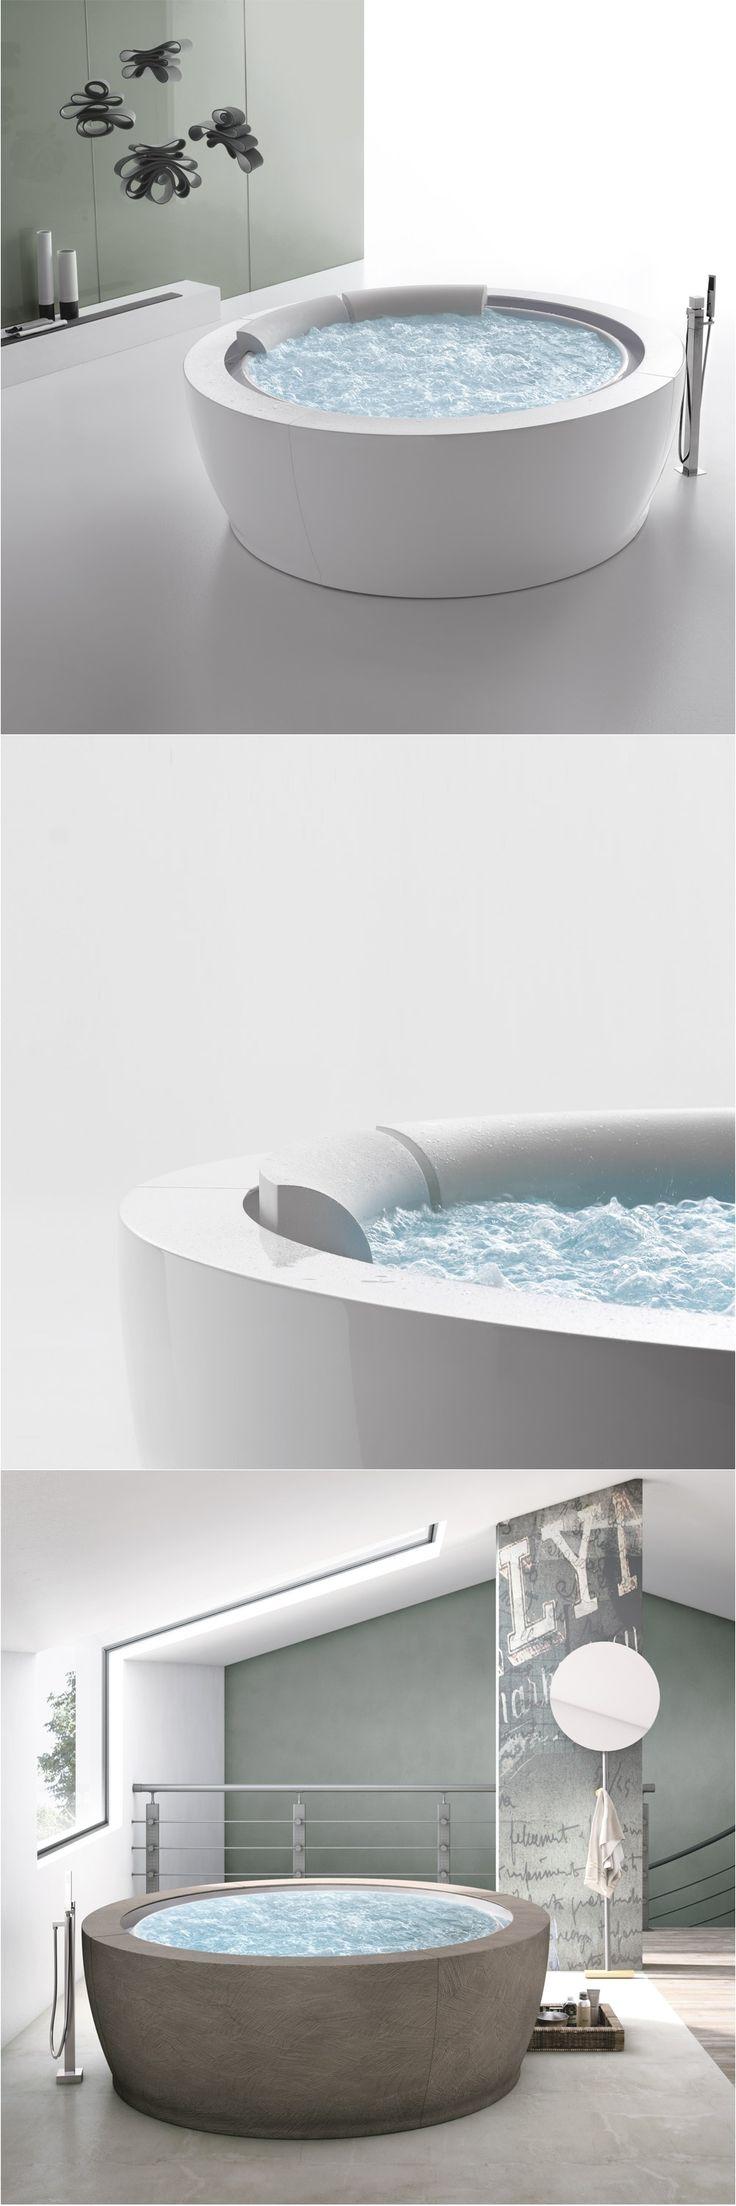 BOLLA INFINITY ø190 hydromassage bathtub. HAFRO GEROMIN » Gruppo Geromin | Design by Franco Bertoli & Davide Danielli